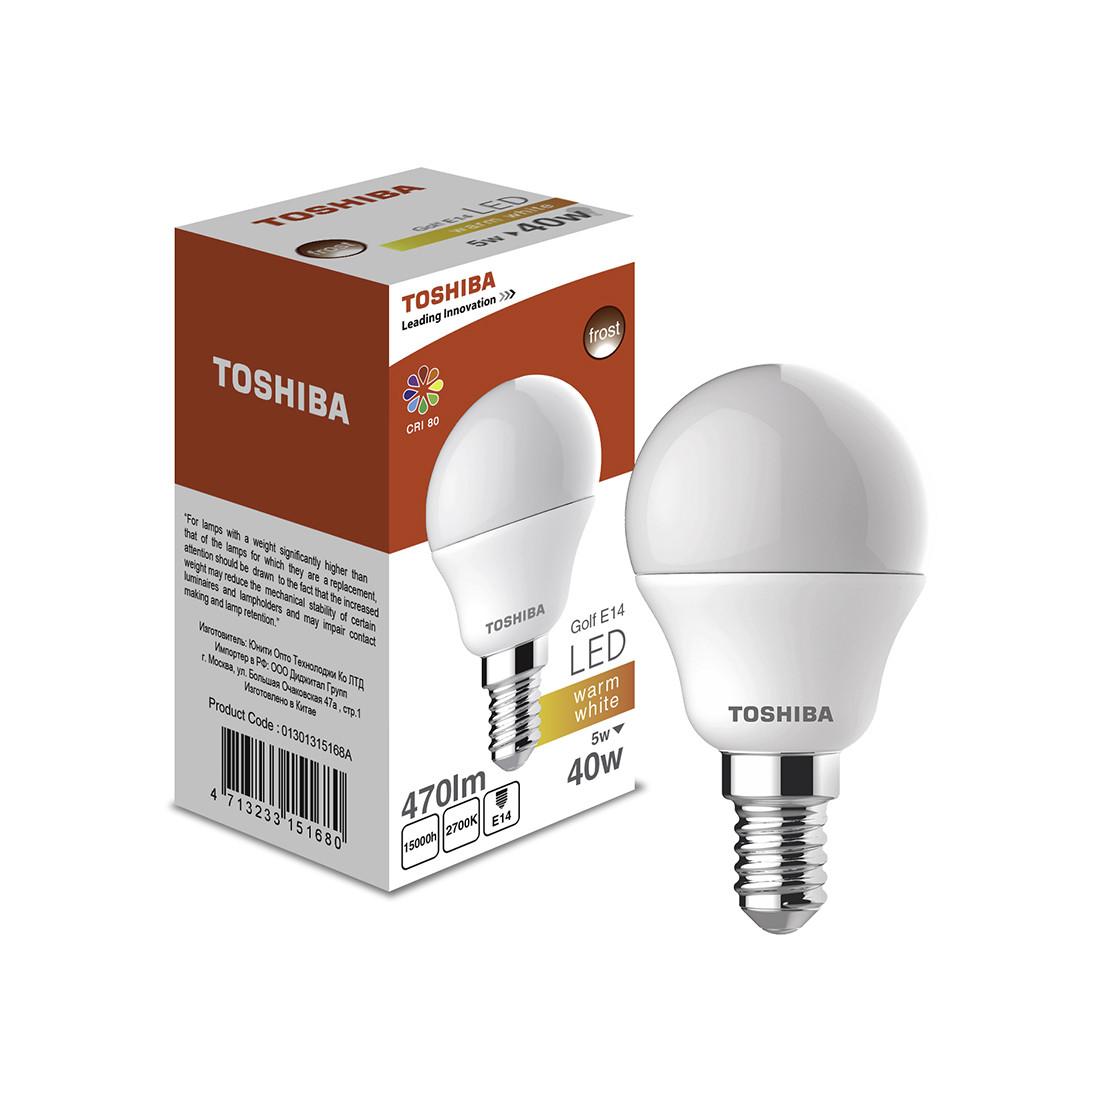 Светодиодная лампа Toshiba Golf 5W (40W) 2700K 470lm E27 ND E27 Тёплый